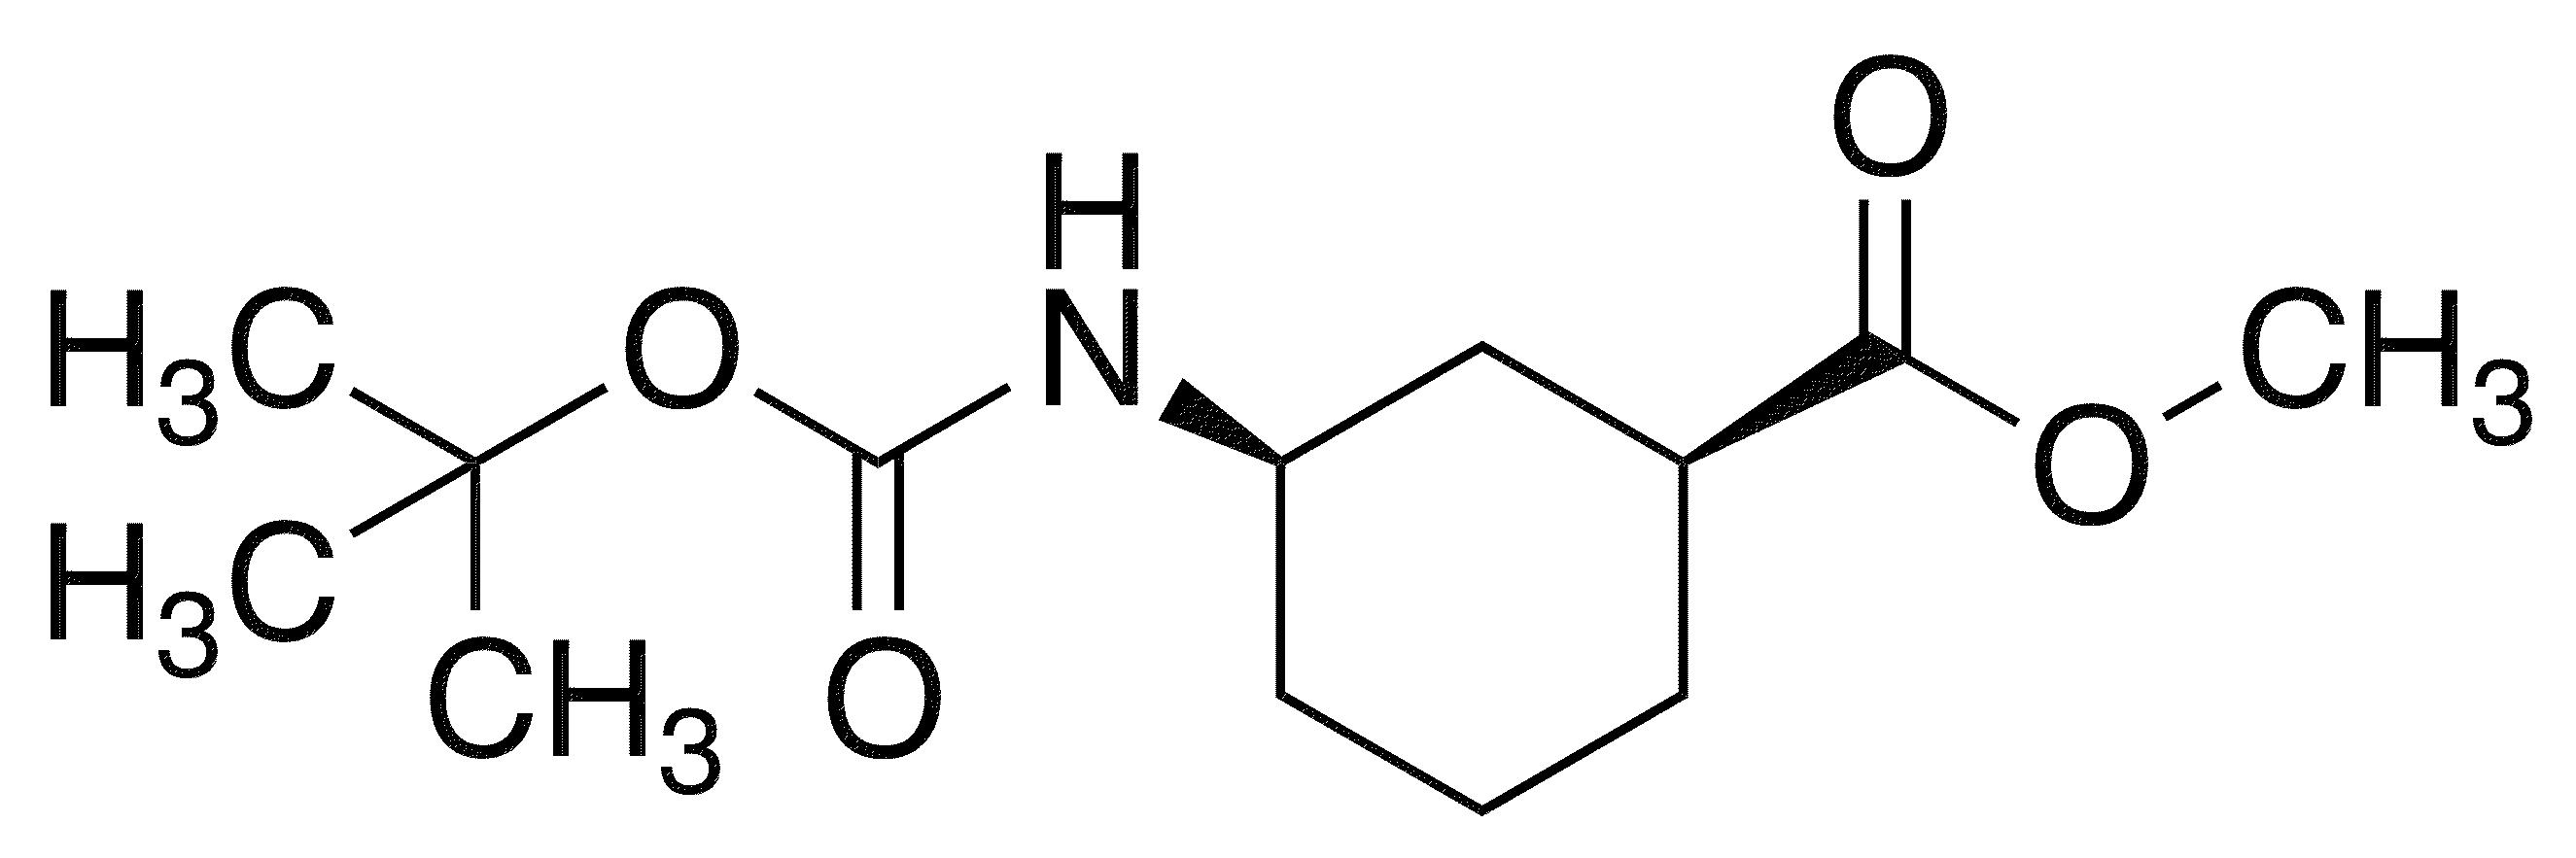 Methyl cis-(+/-)-3-{[(tert-butoxy)carbonyl]amino}cyclohexane-1-carboxylate